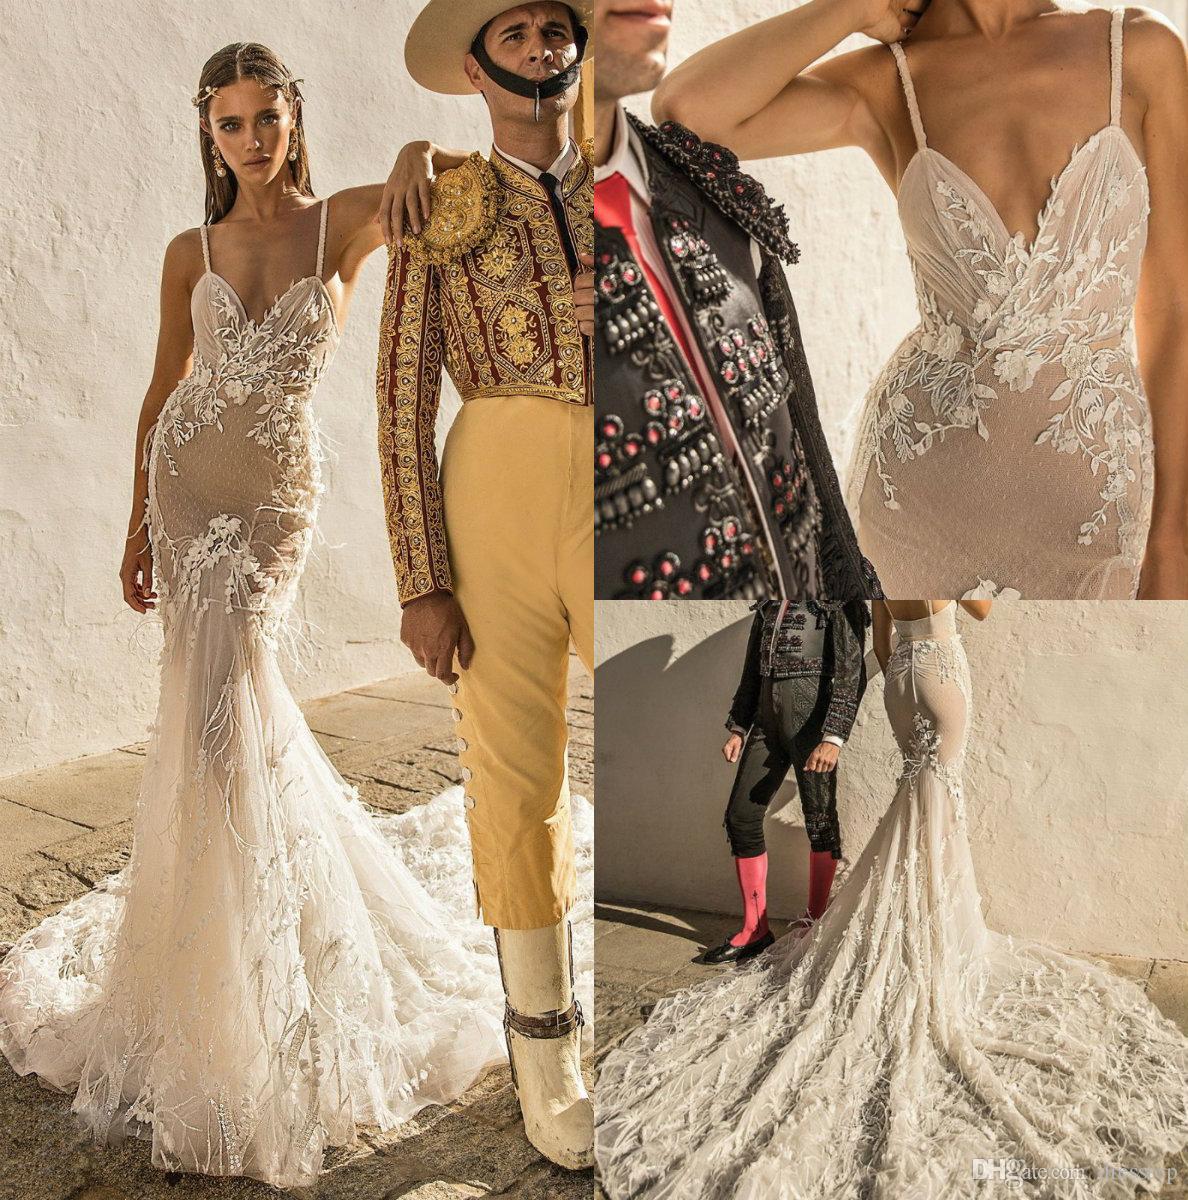 Berta Mermaid Wedding Dresses 2019 Spaghetti Backless Lace Bridal Gowns With Feathers Plus Size vestido de novia Beach Wedding Dress